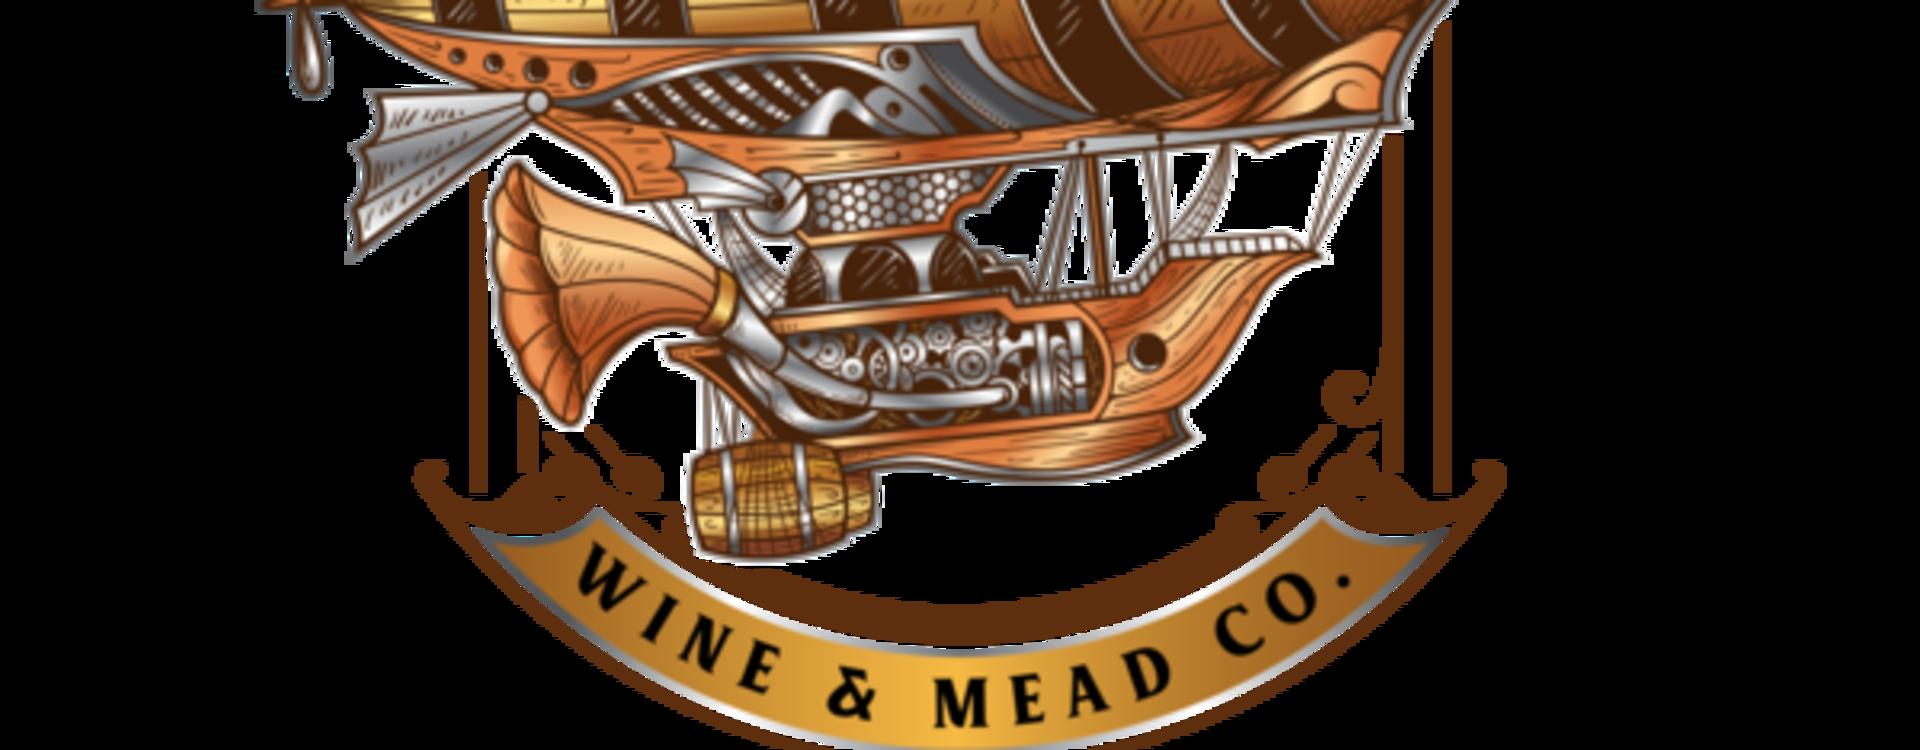 Contrivance Wine & Mead Co. in Tukwila